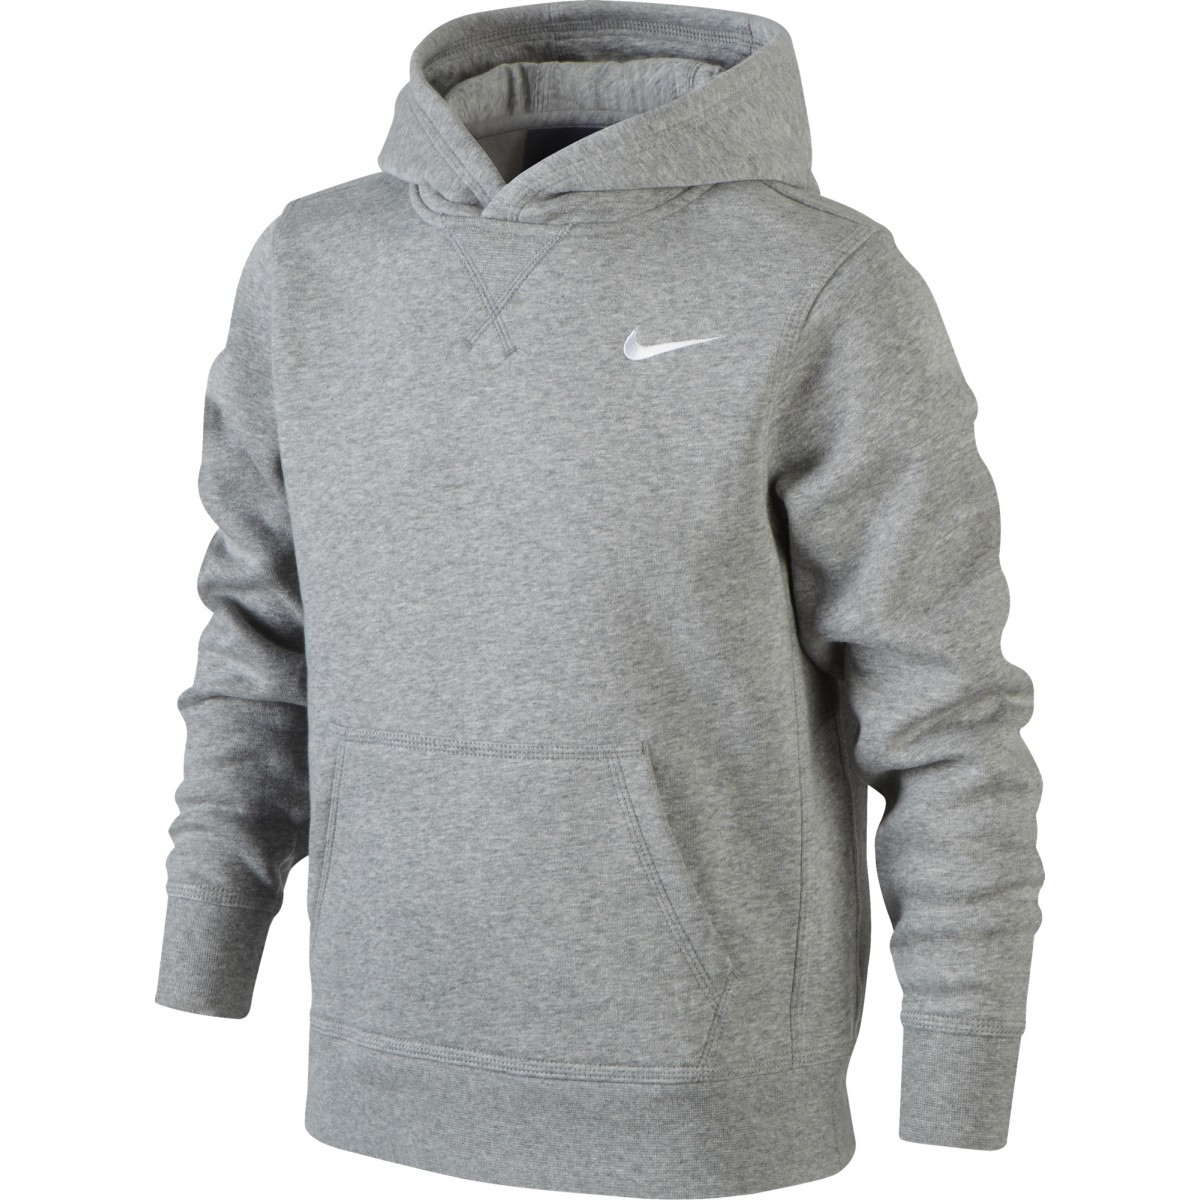 nike junior swet a capuche ya76brushed fleece ref619080-010 12 ans